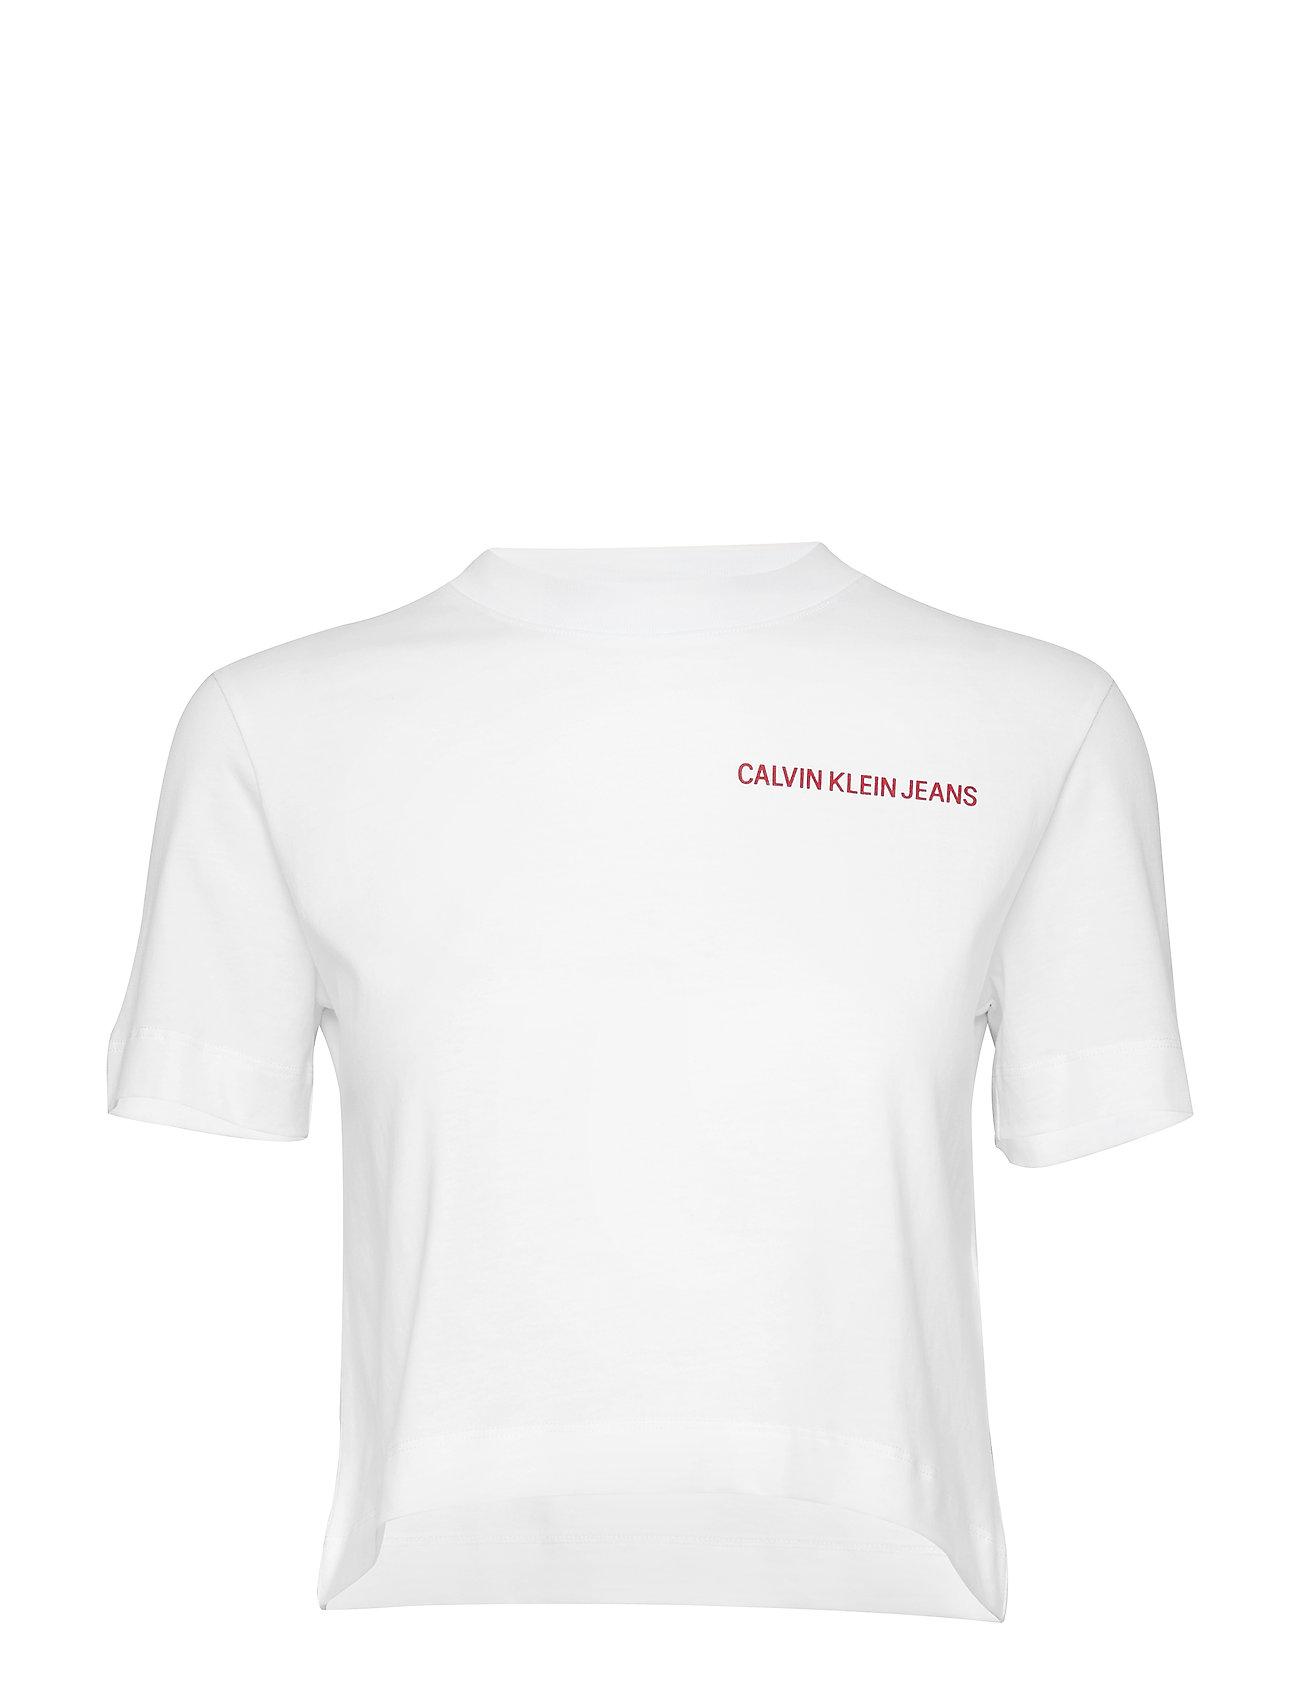 Image of Multi Instit Back Lo T-shirt Top Hvid CALVIN KLEIN JEANS (3160759717)